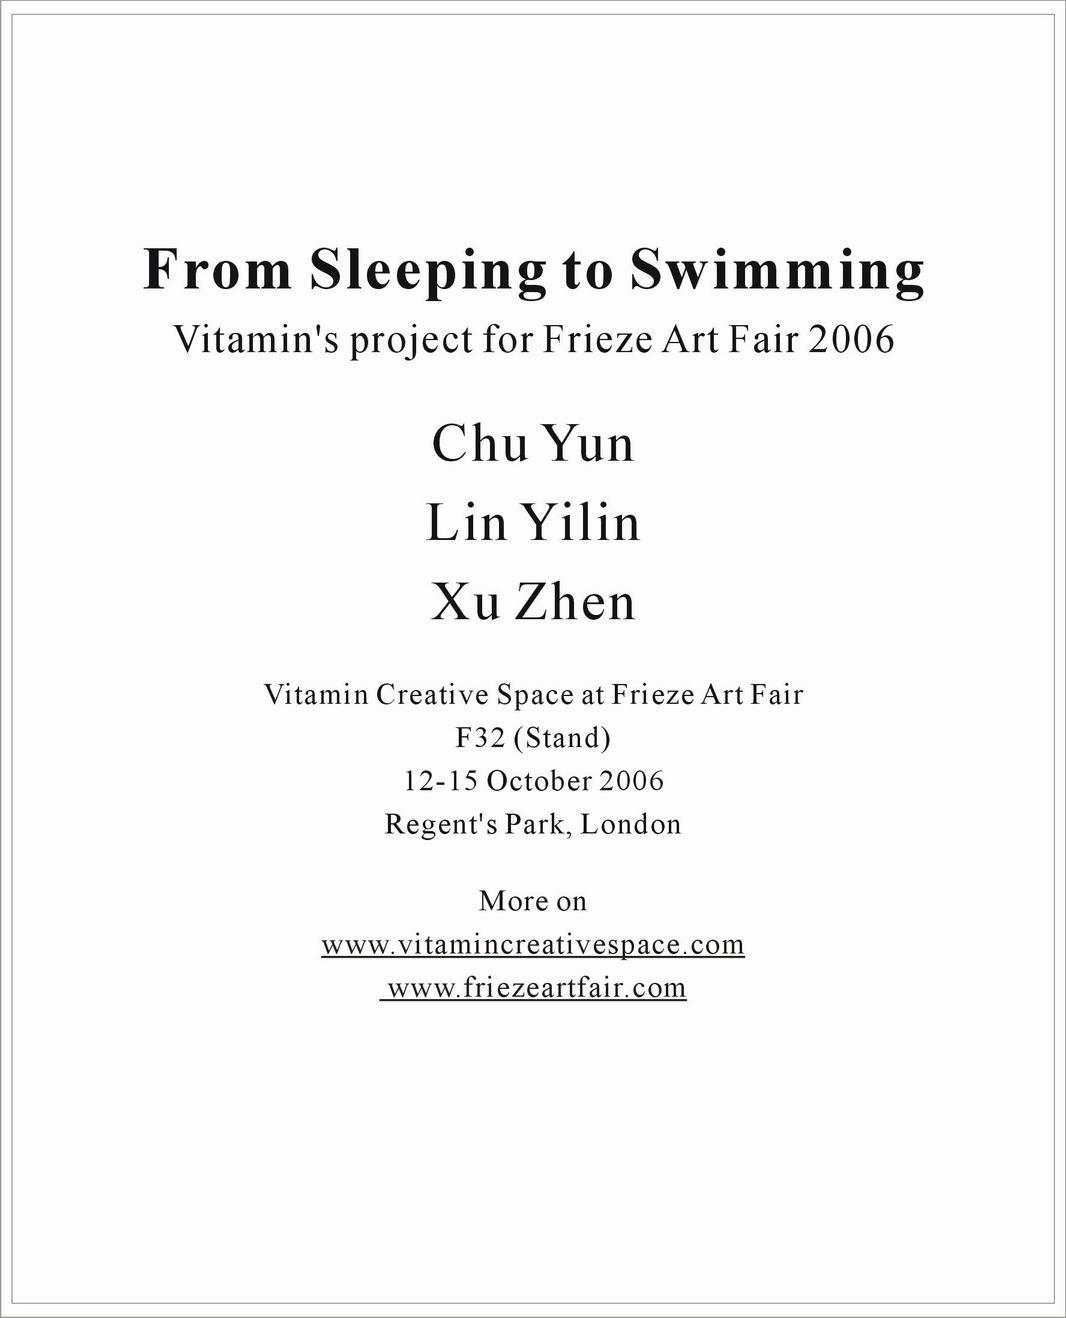 2006 Frieze Art Fair Vitamin Invitation